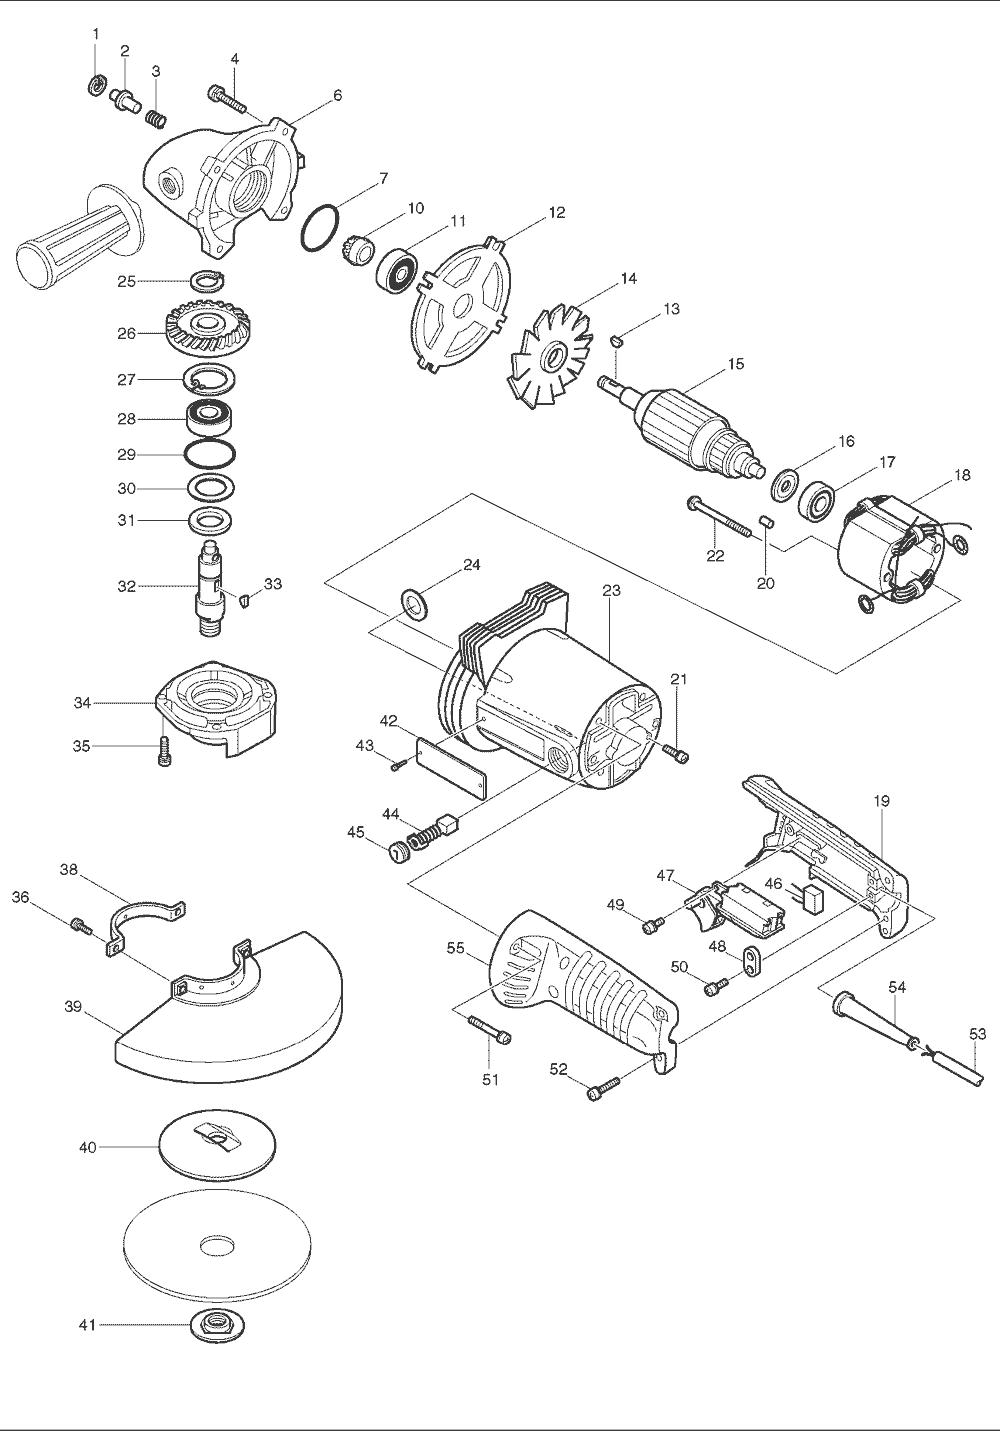 Buy Makita GA7001L 7 Inch AC/DC Angle Replacement Tool